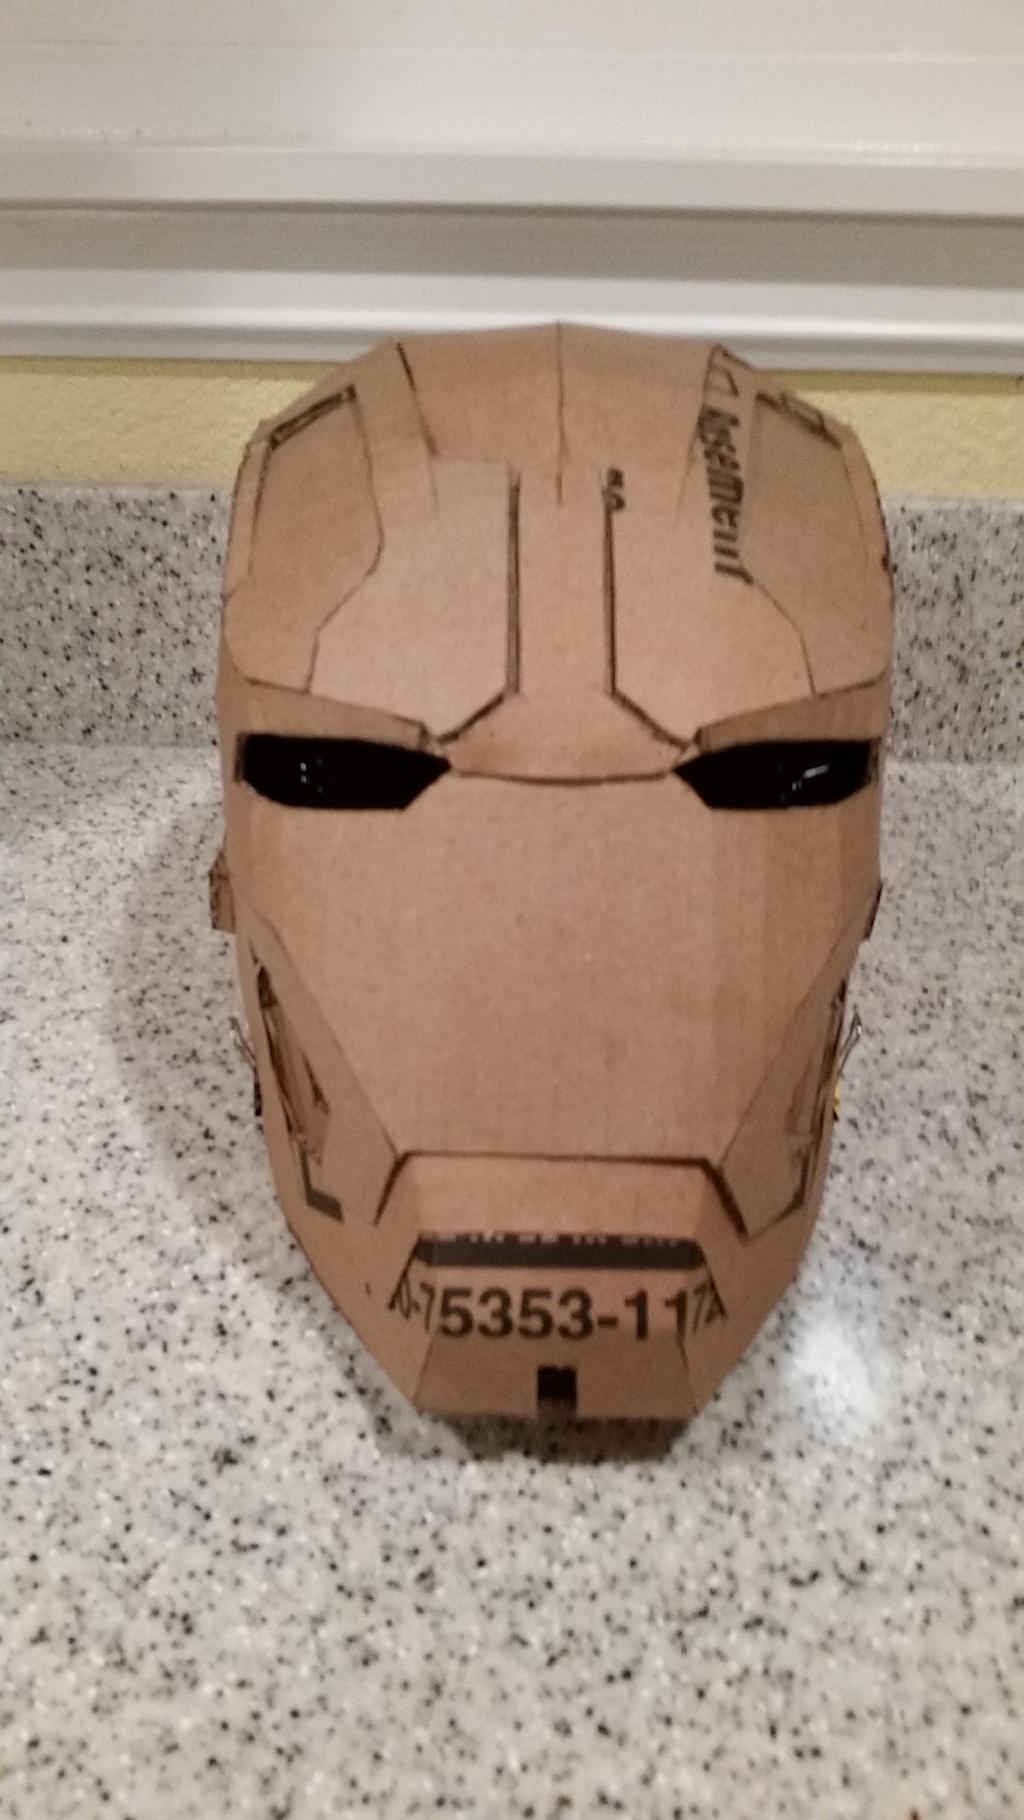 How To Make Iron Man Helmet : helmet, Quick, 7-day, Mk.42, Helmet, Build, Costume, Maker, Community, 405th